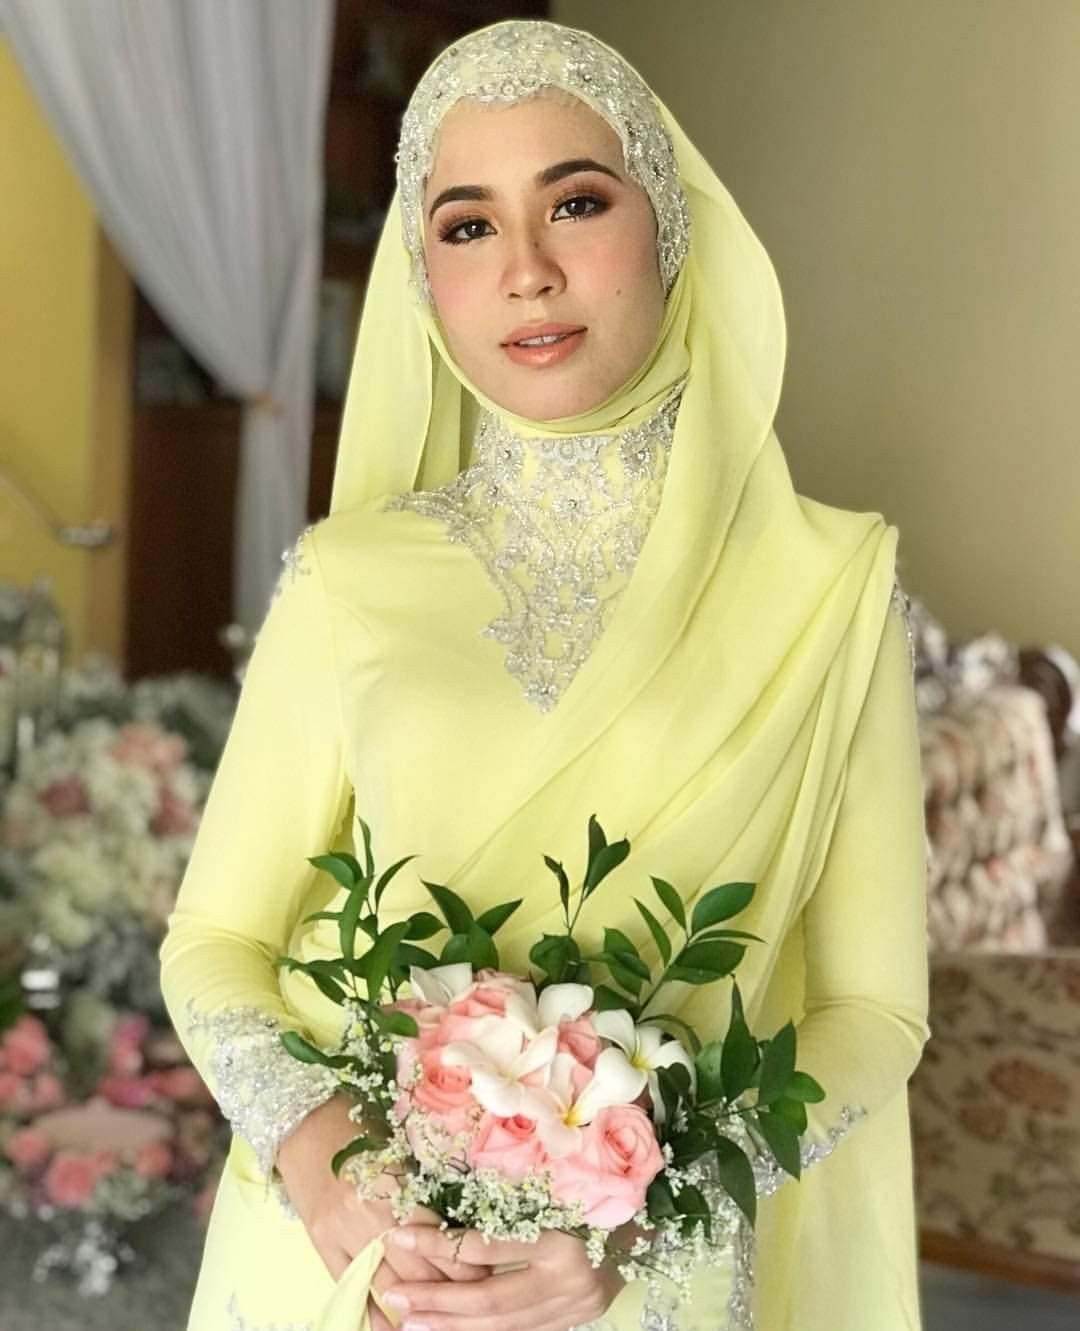 Baju tunang bella dally | Muslimah wedding dress, Wedding dresses, Muslimah wedding